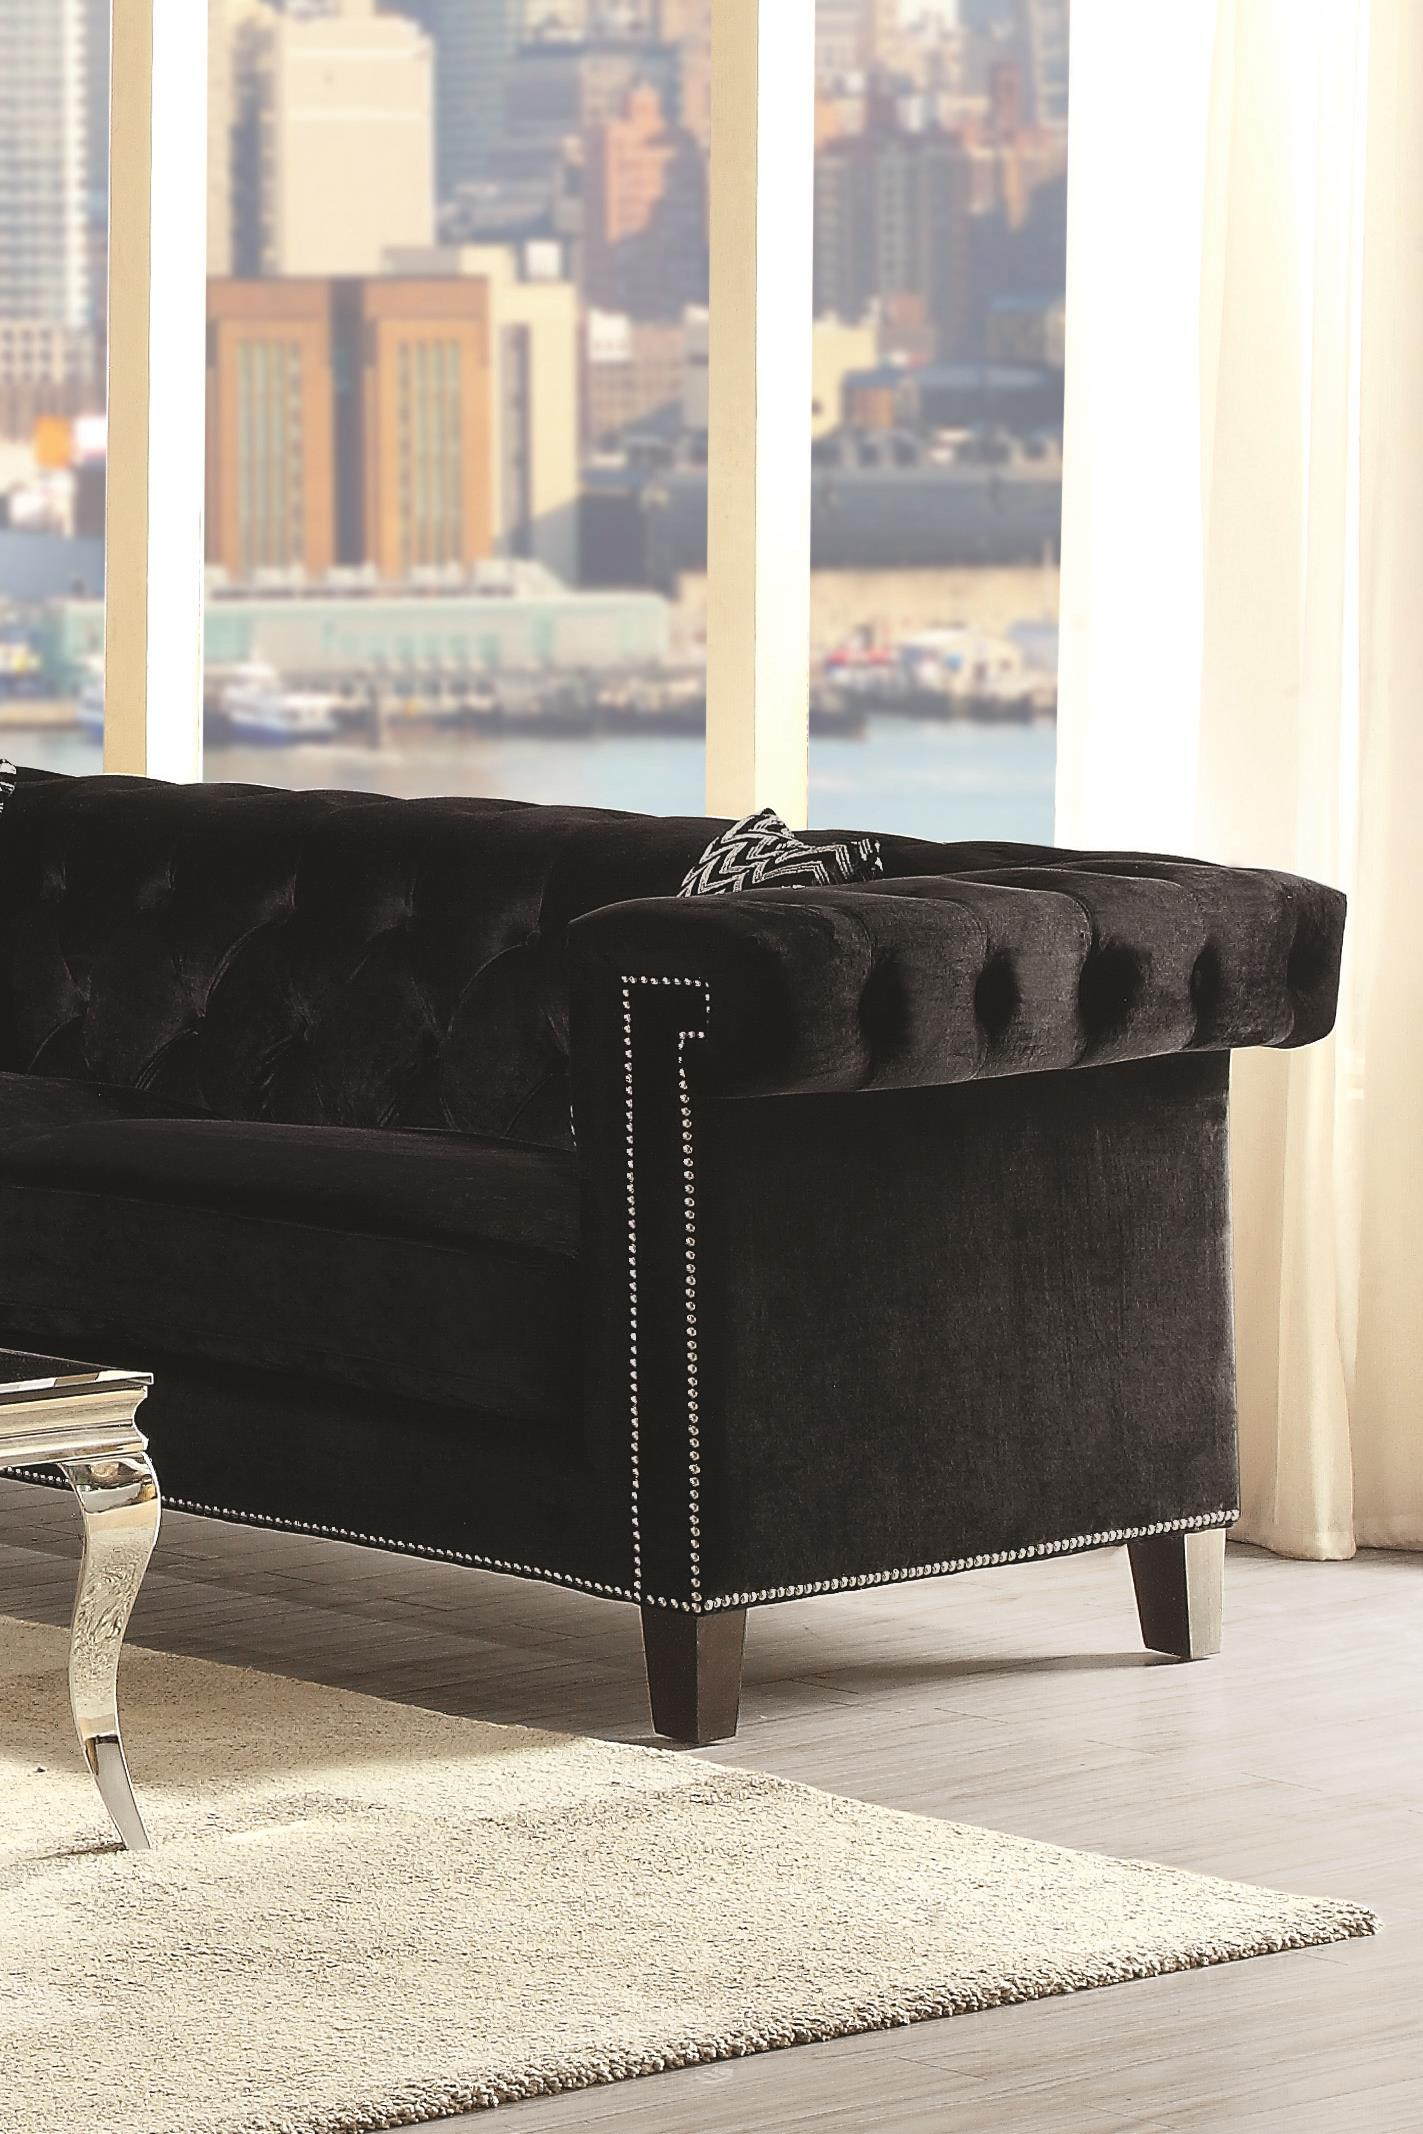 Coaster Reventlow 505817 Sofa | Northeast Factory Direct | Sofas Cleveland,  Eastlake, Westlake, Mentor, Medina, Ohio